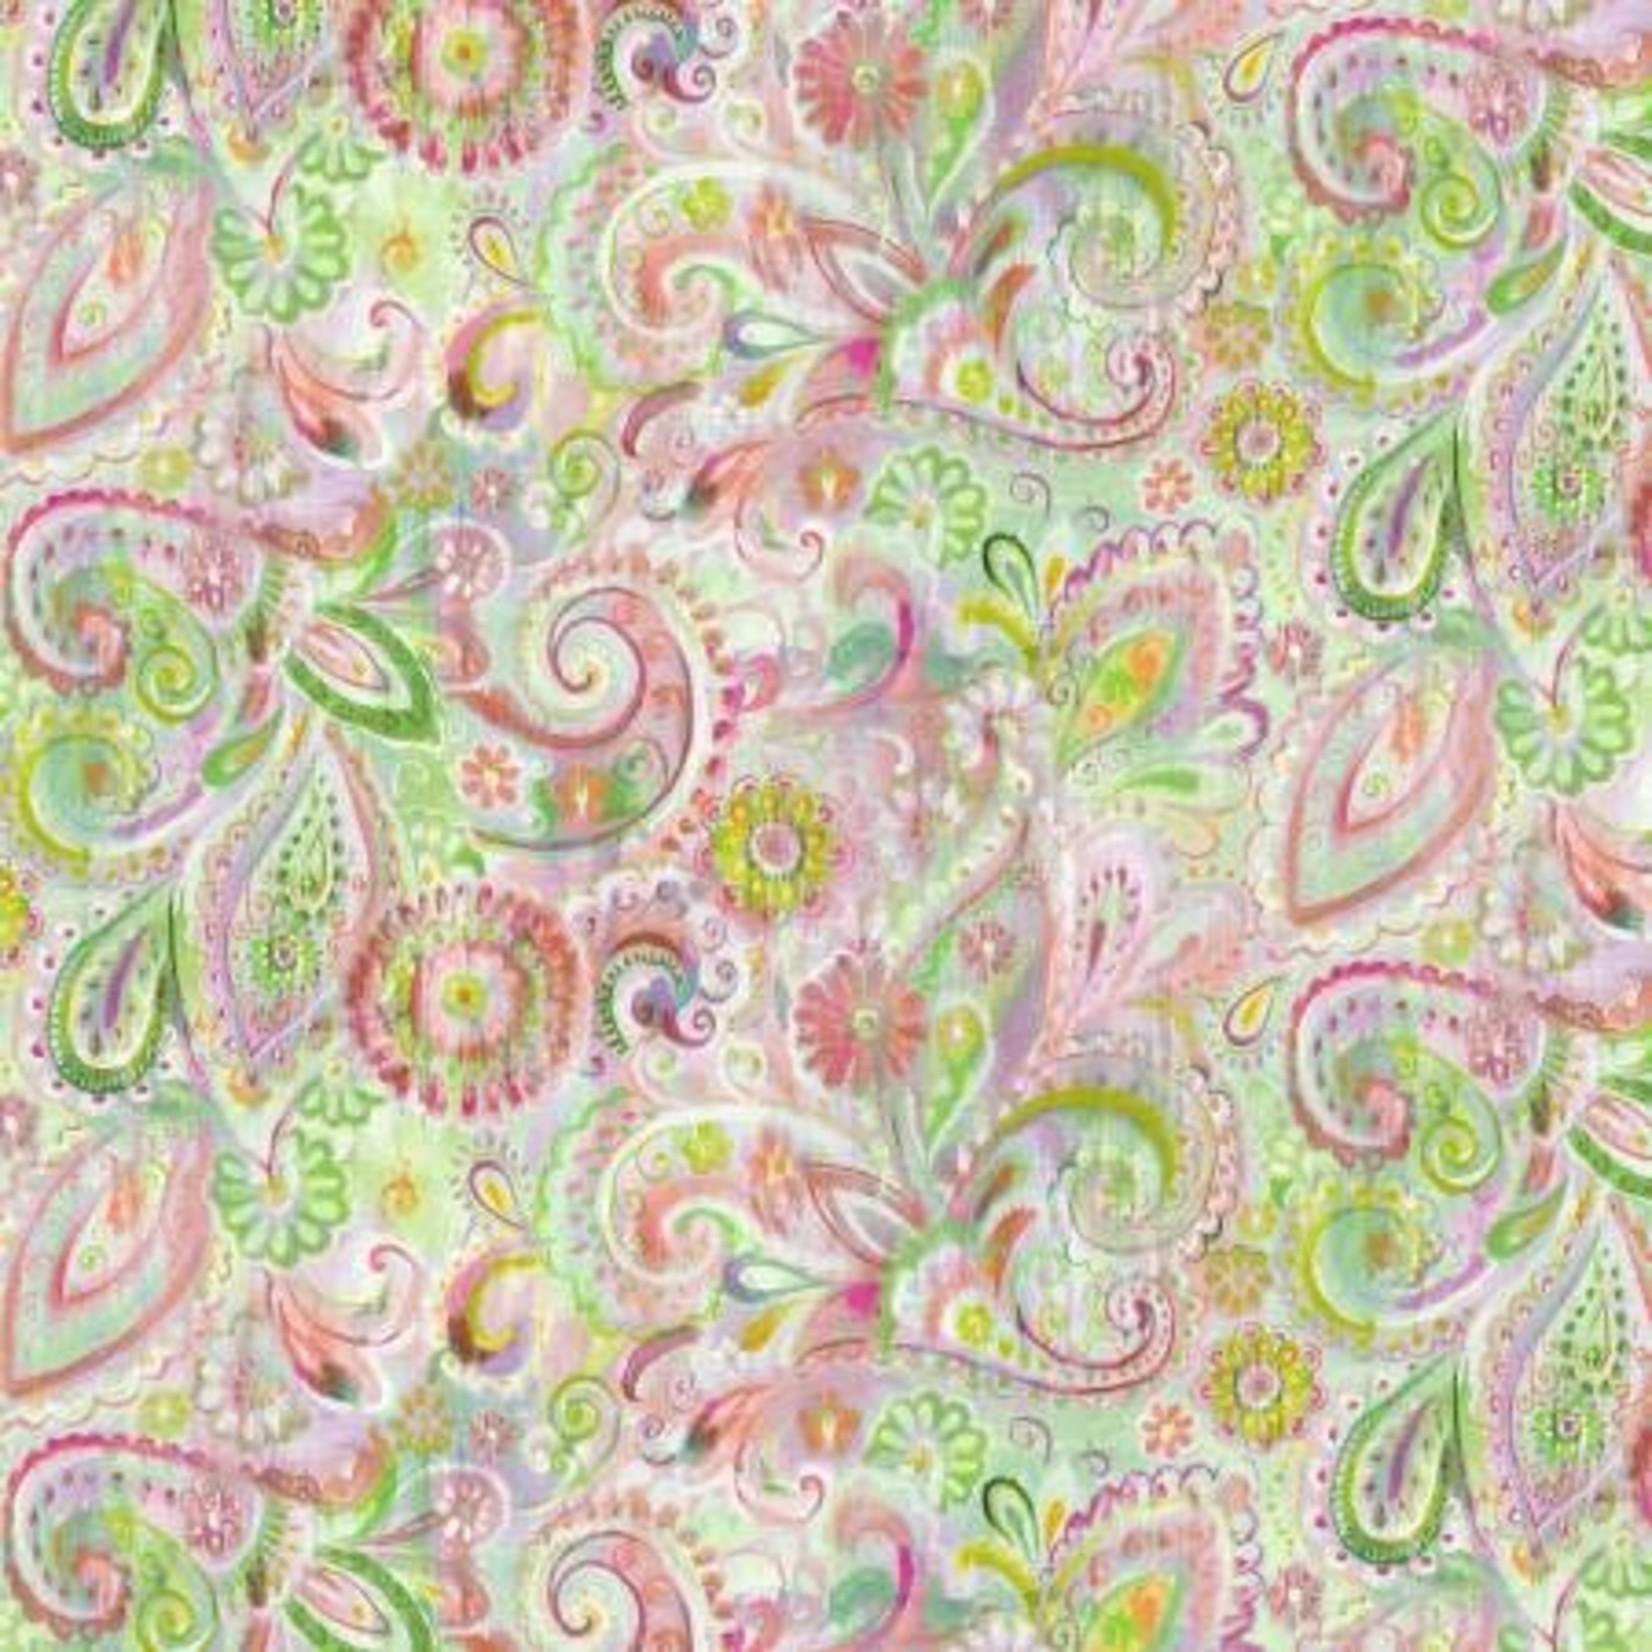 Wilmington Prints Bohemian Dreams - Dream Paisley - Pink